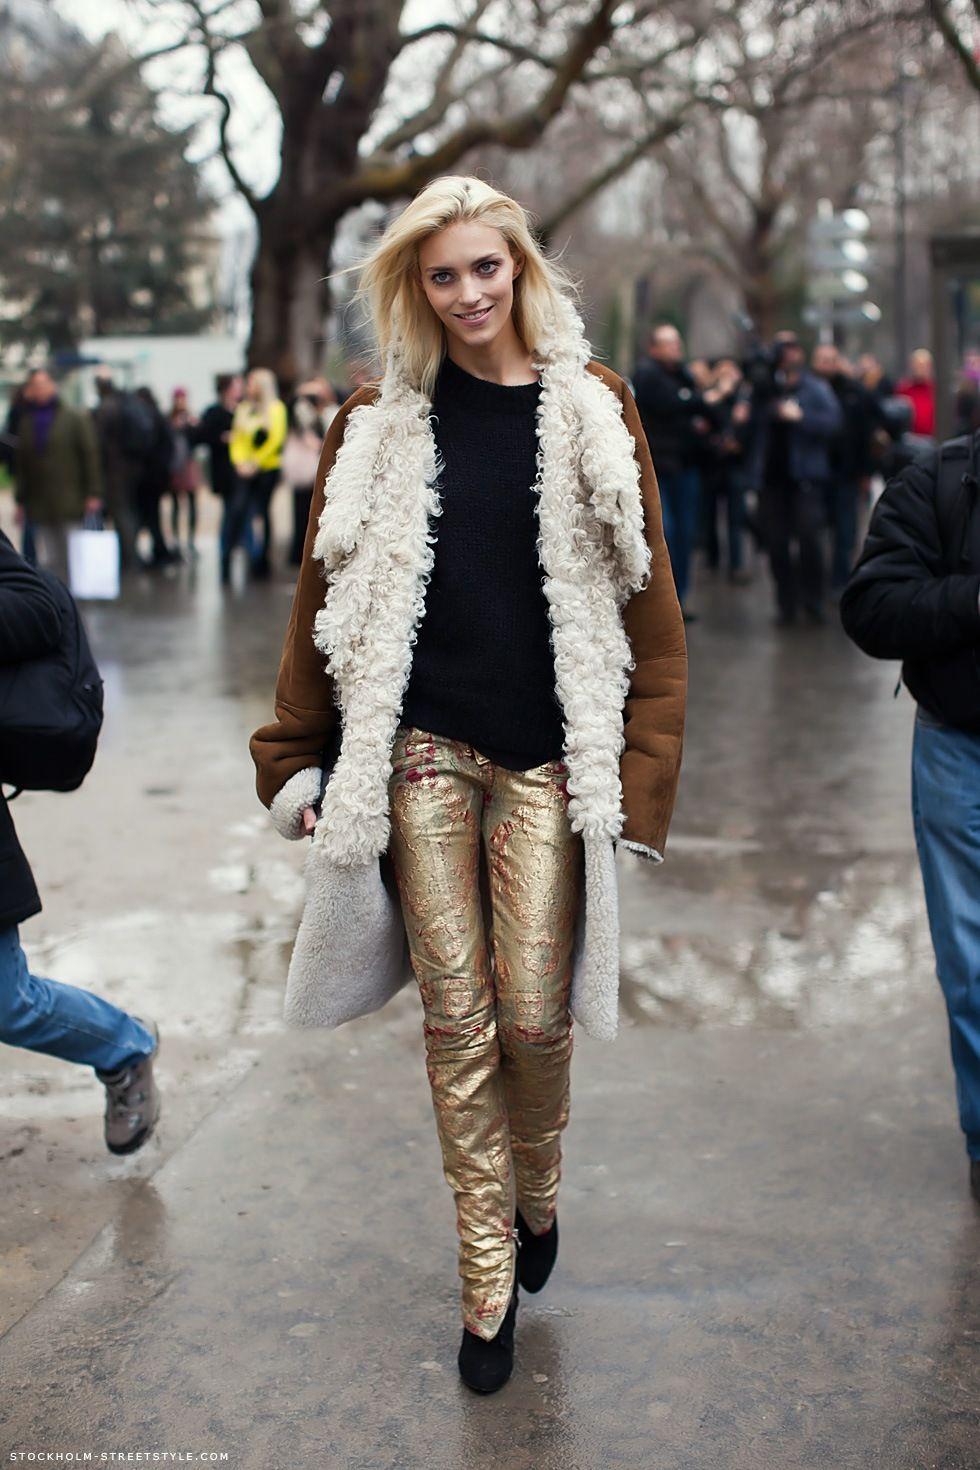 the pants, the jacket, the fur.. so joy!